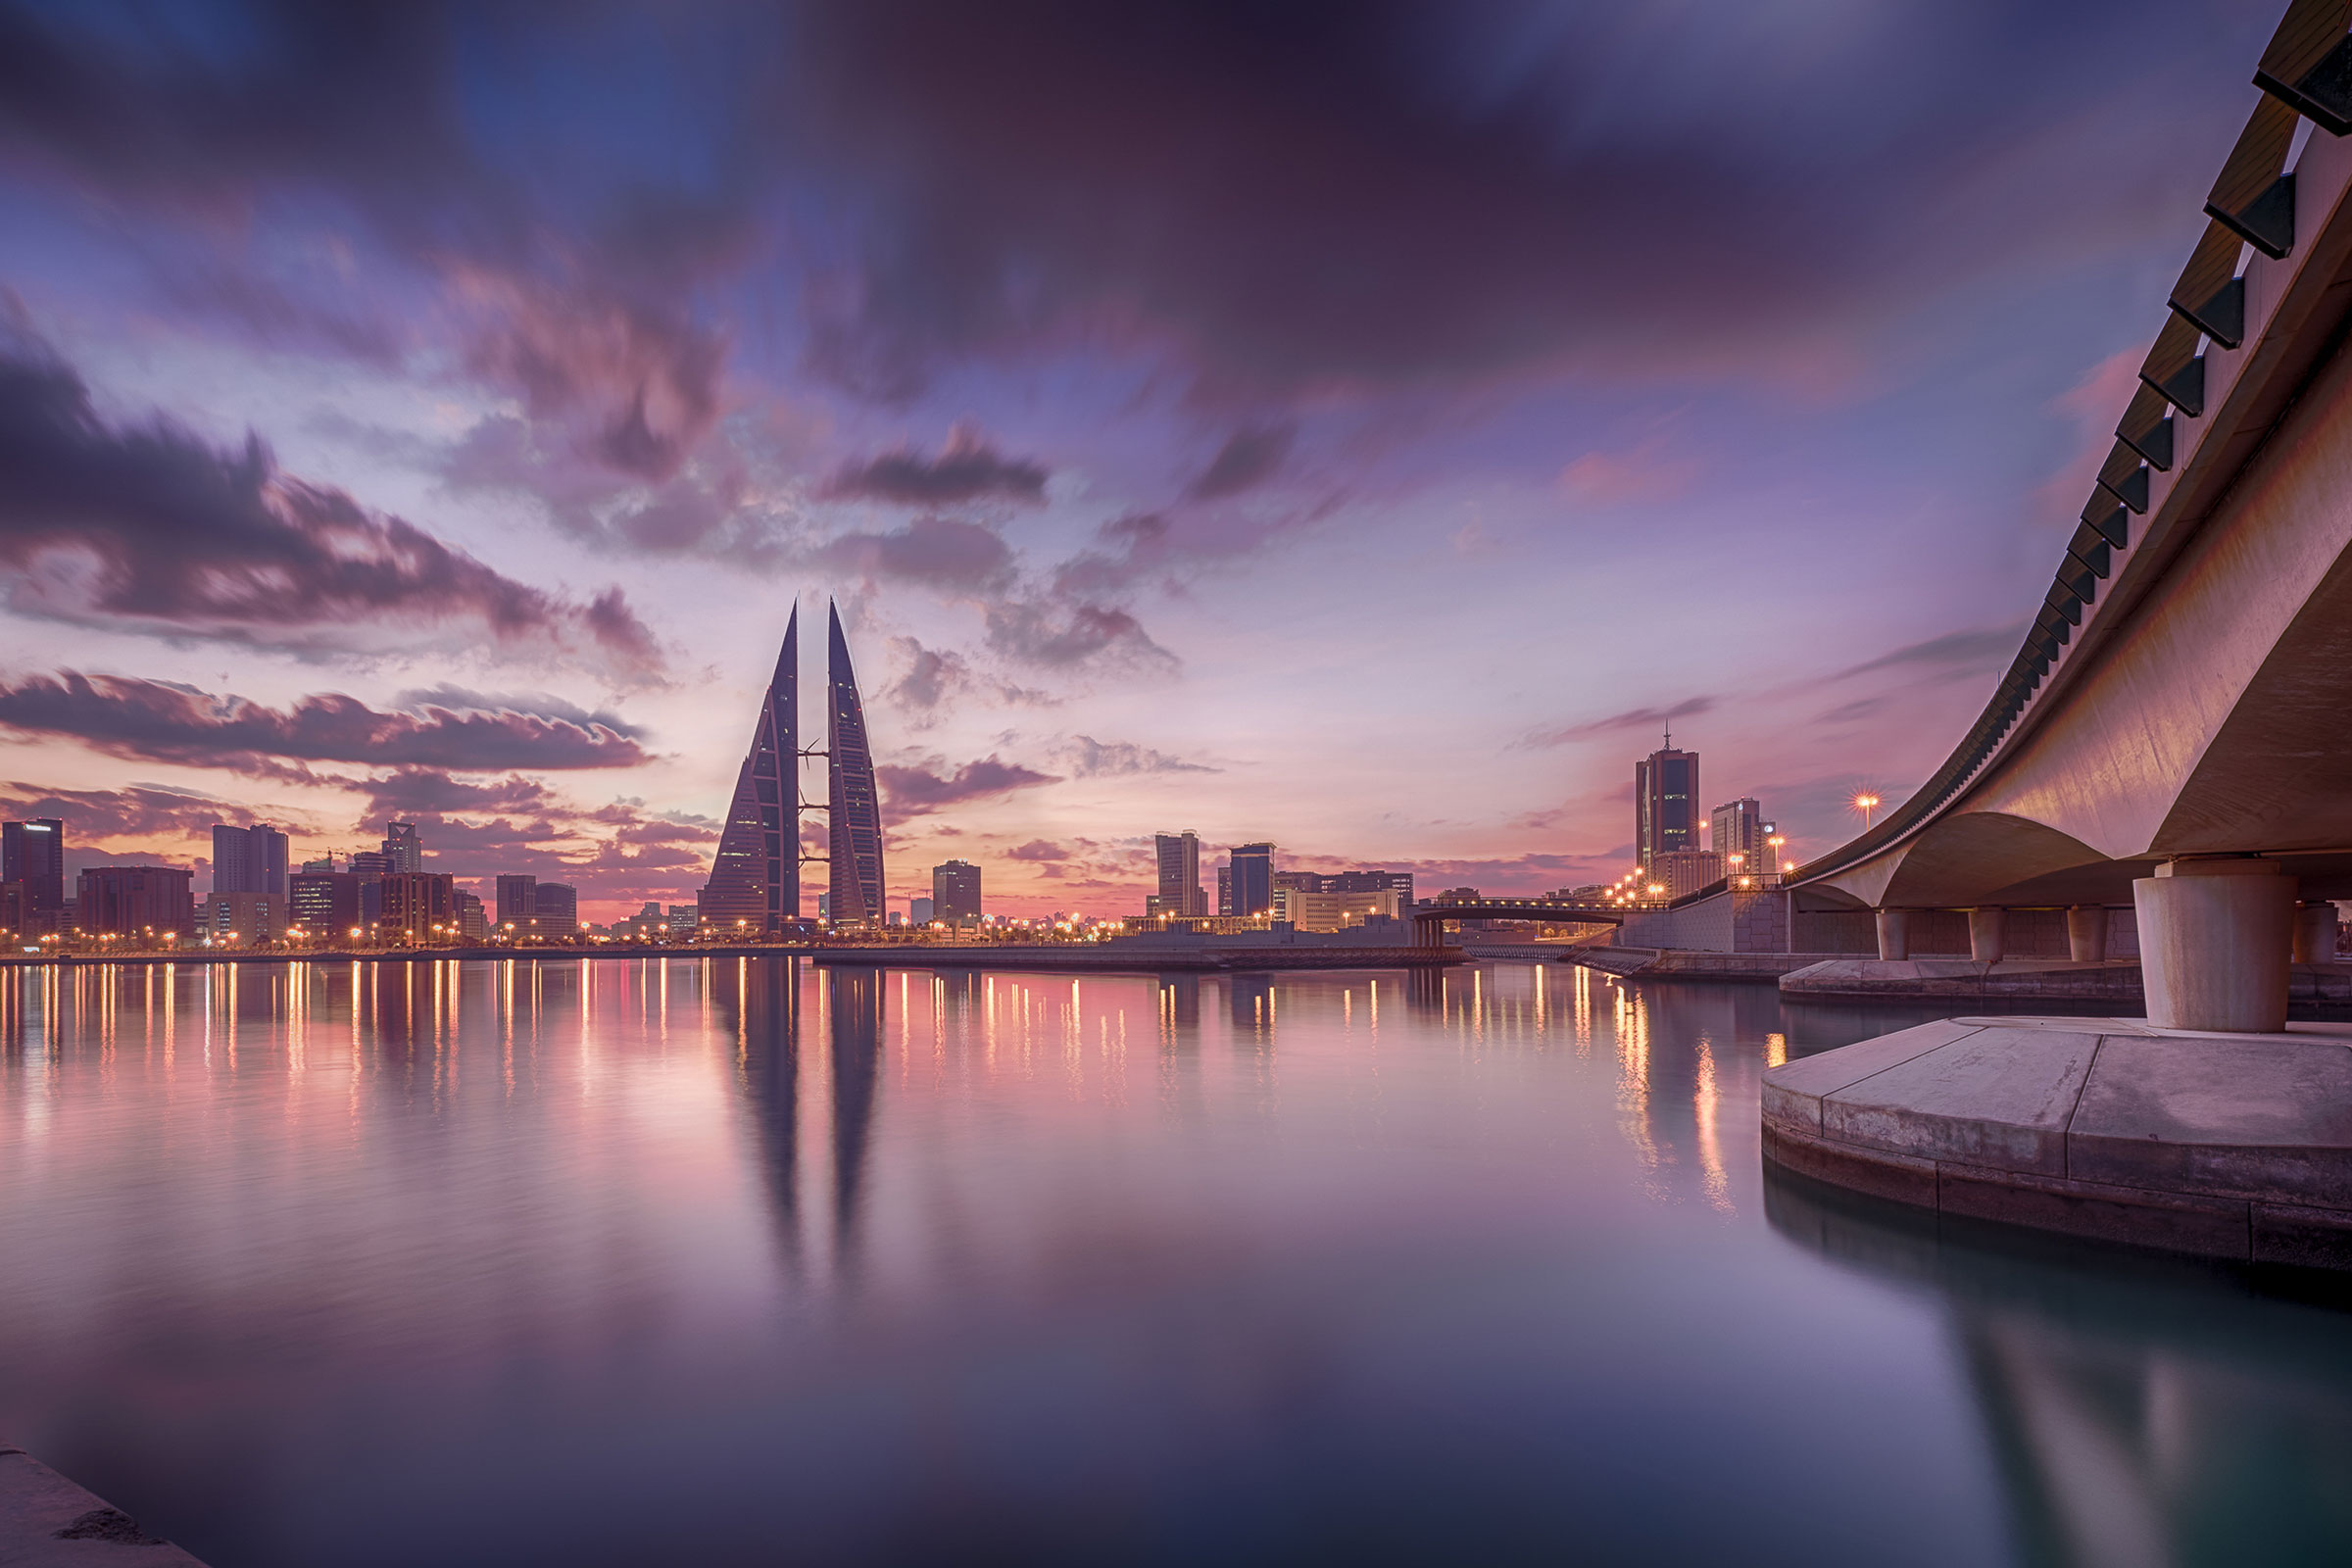 Evening Skyline City Manama, Bahrain